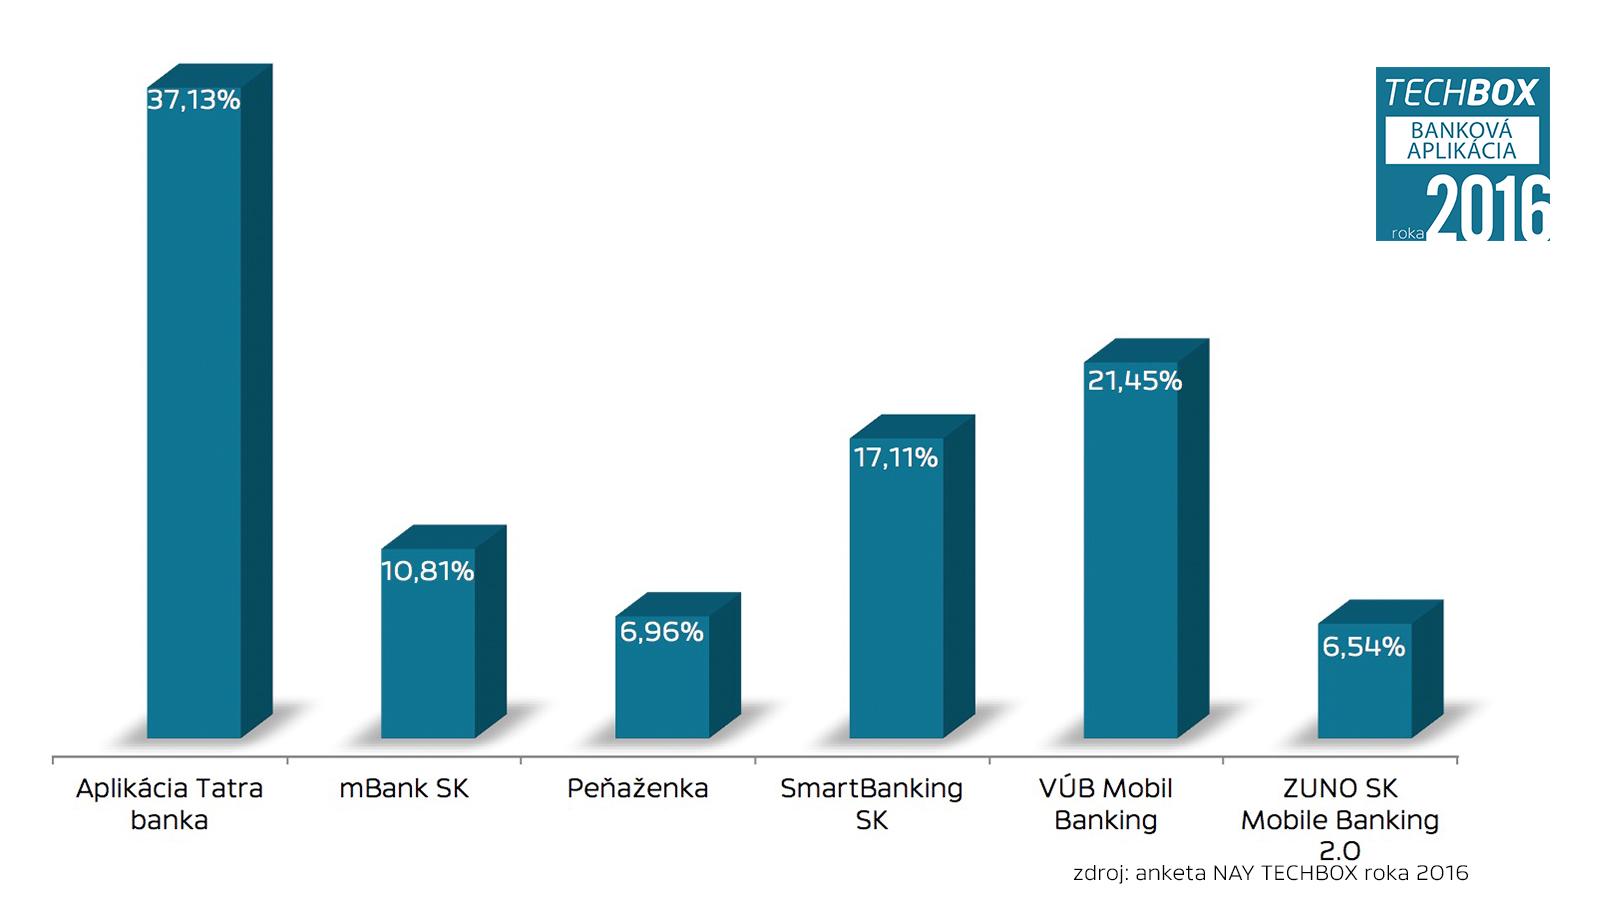 NAY TECHBOX roka 2016 - bankova aplikacia